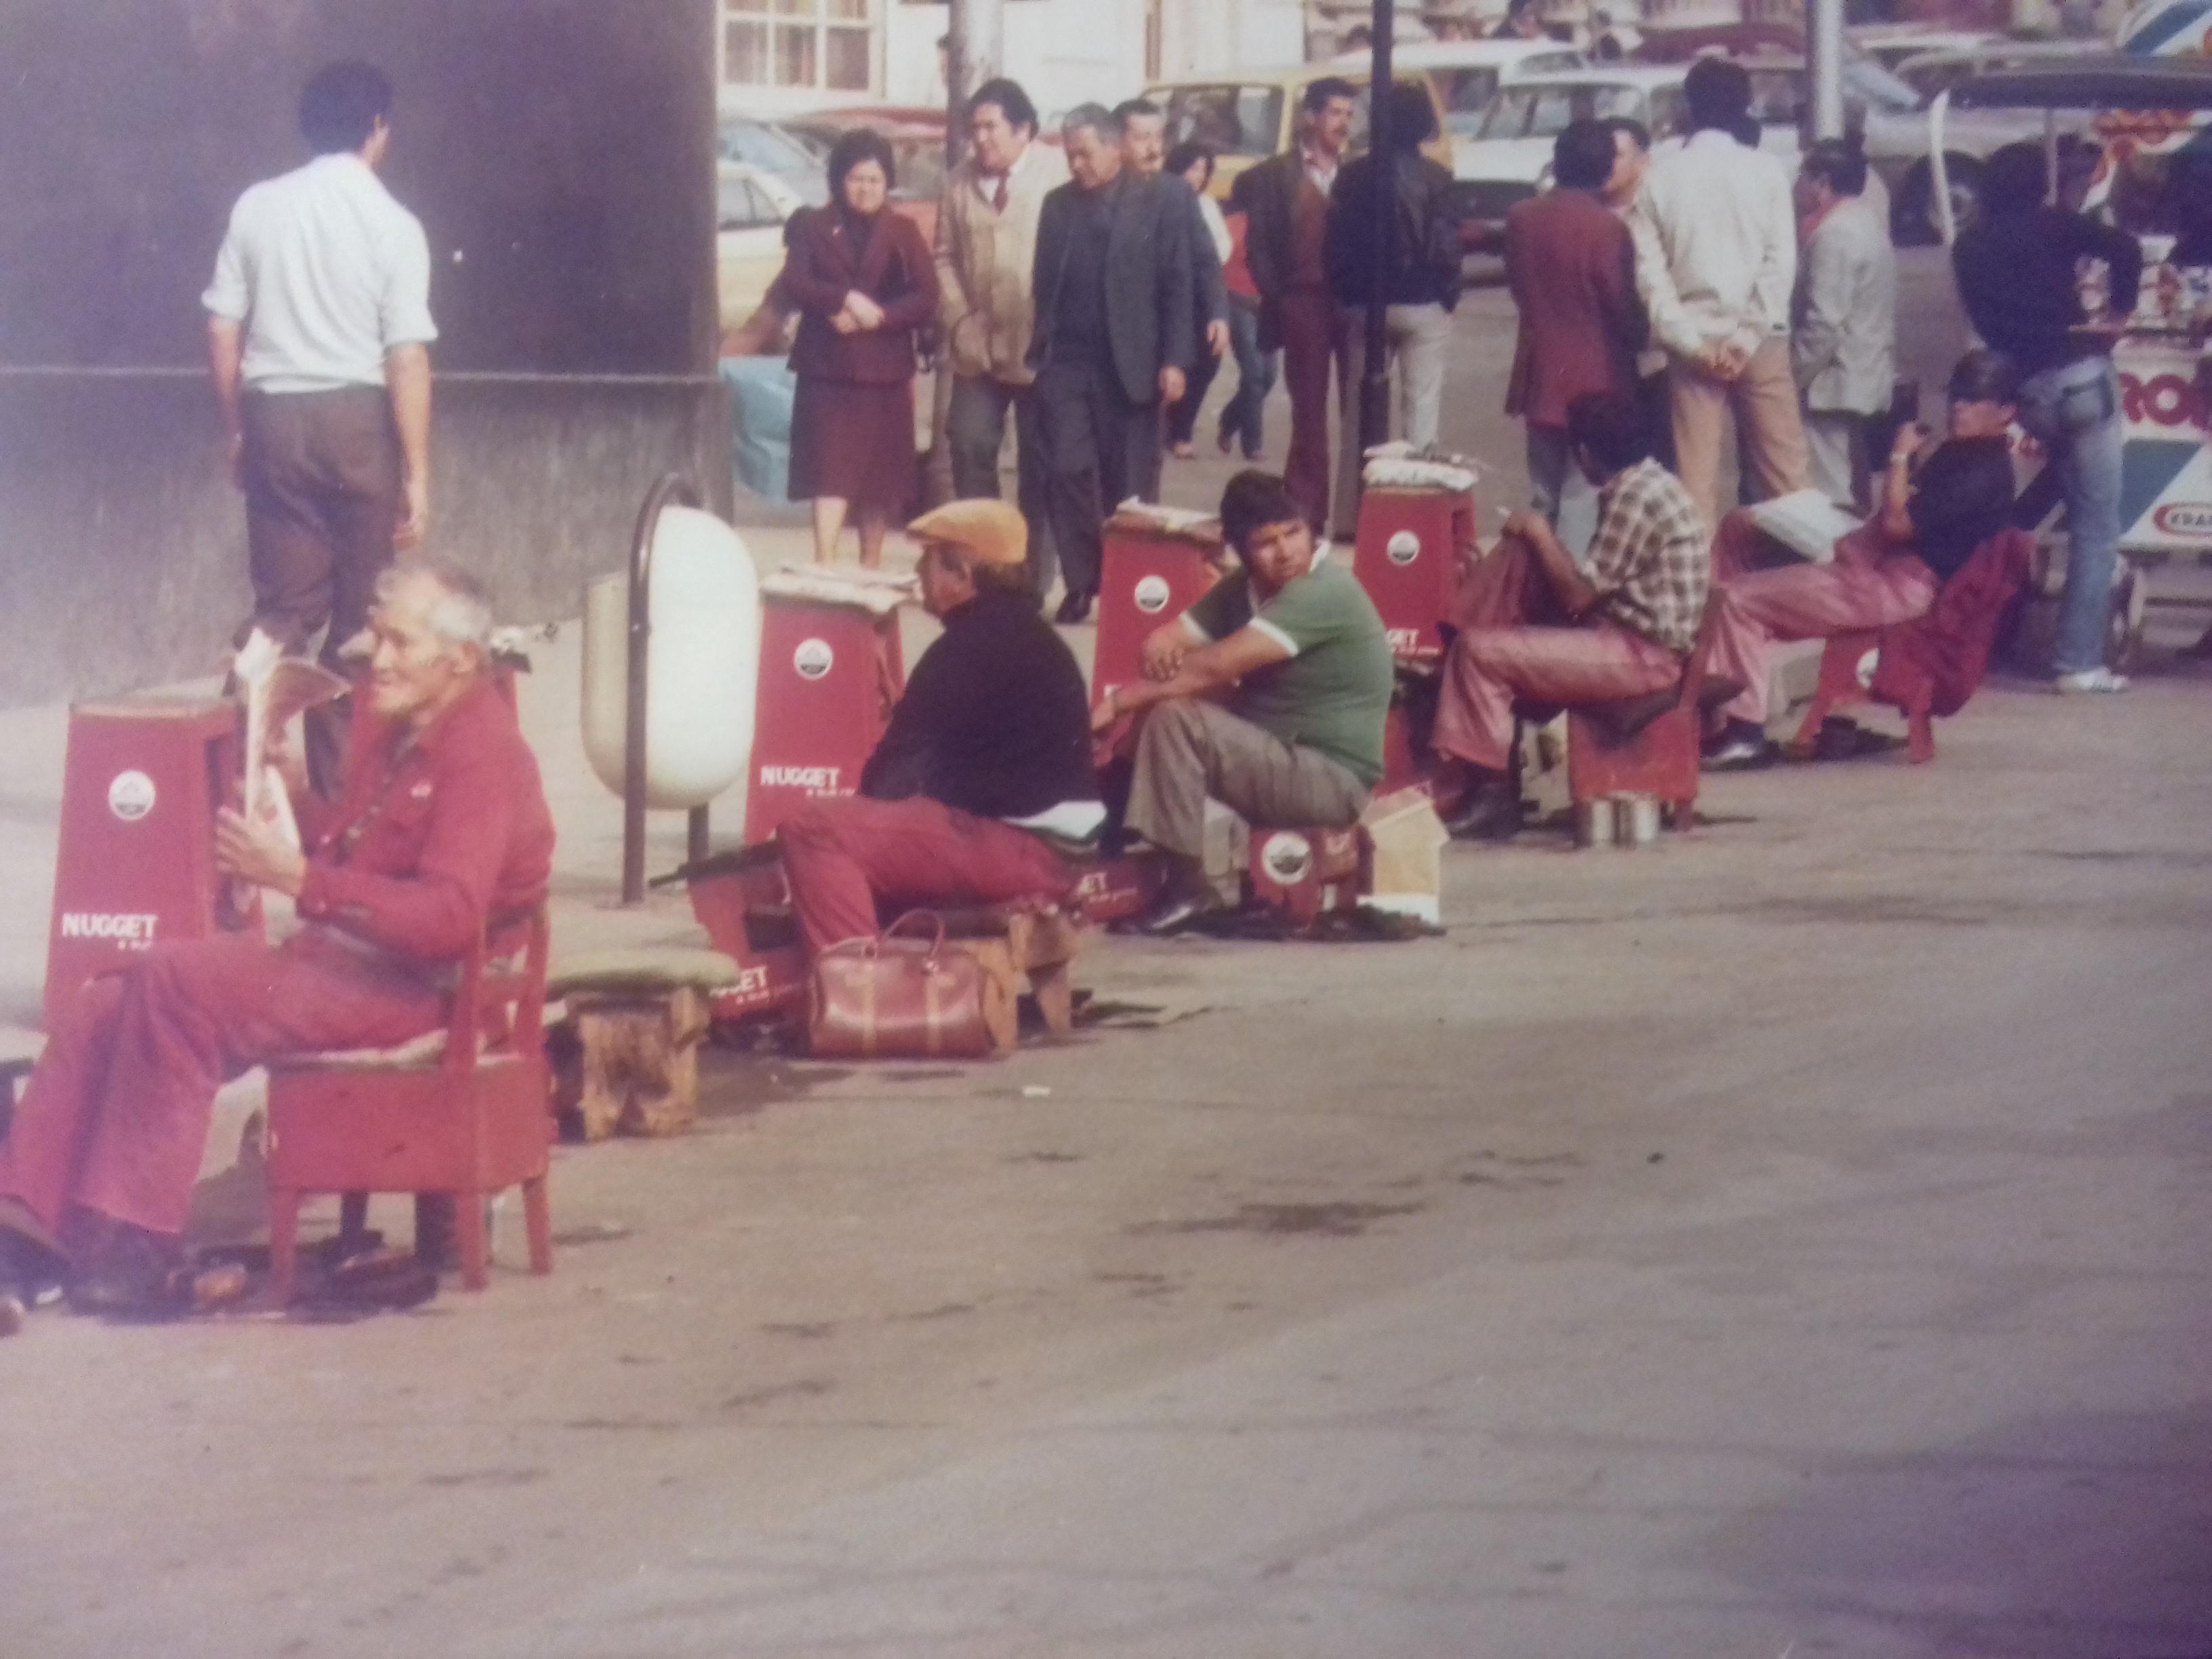 Enterreno - Fotos históricas de chile - fotos antiguas de Chile - Limpia botas en Valparaíso, 1982